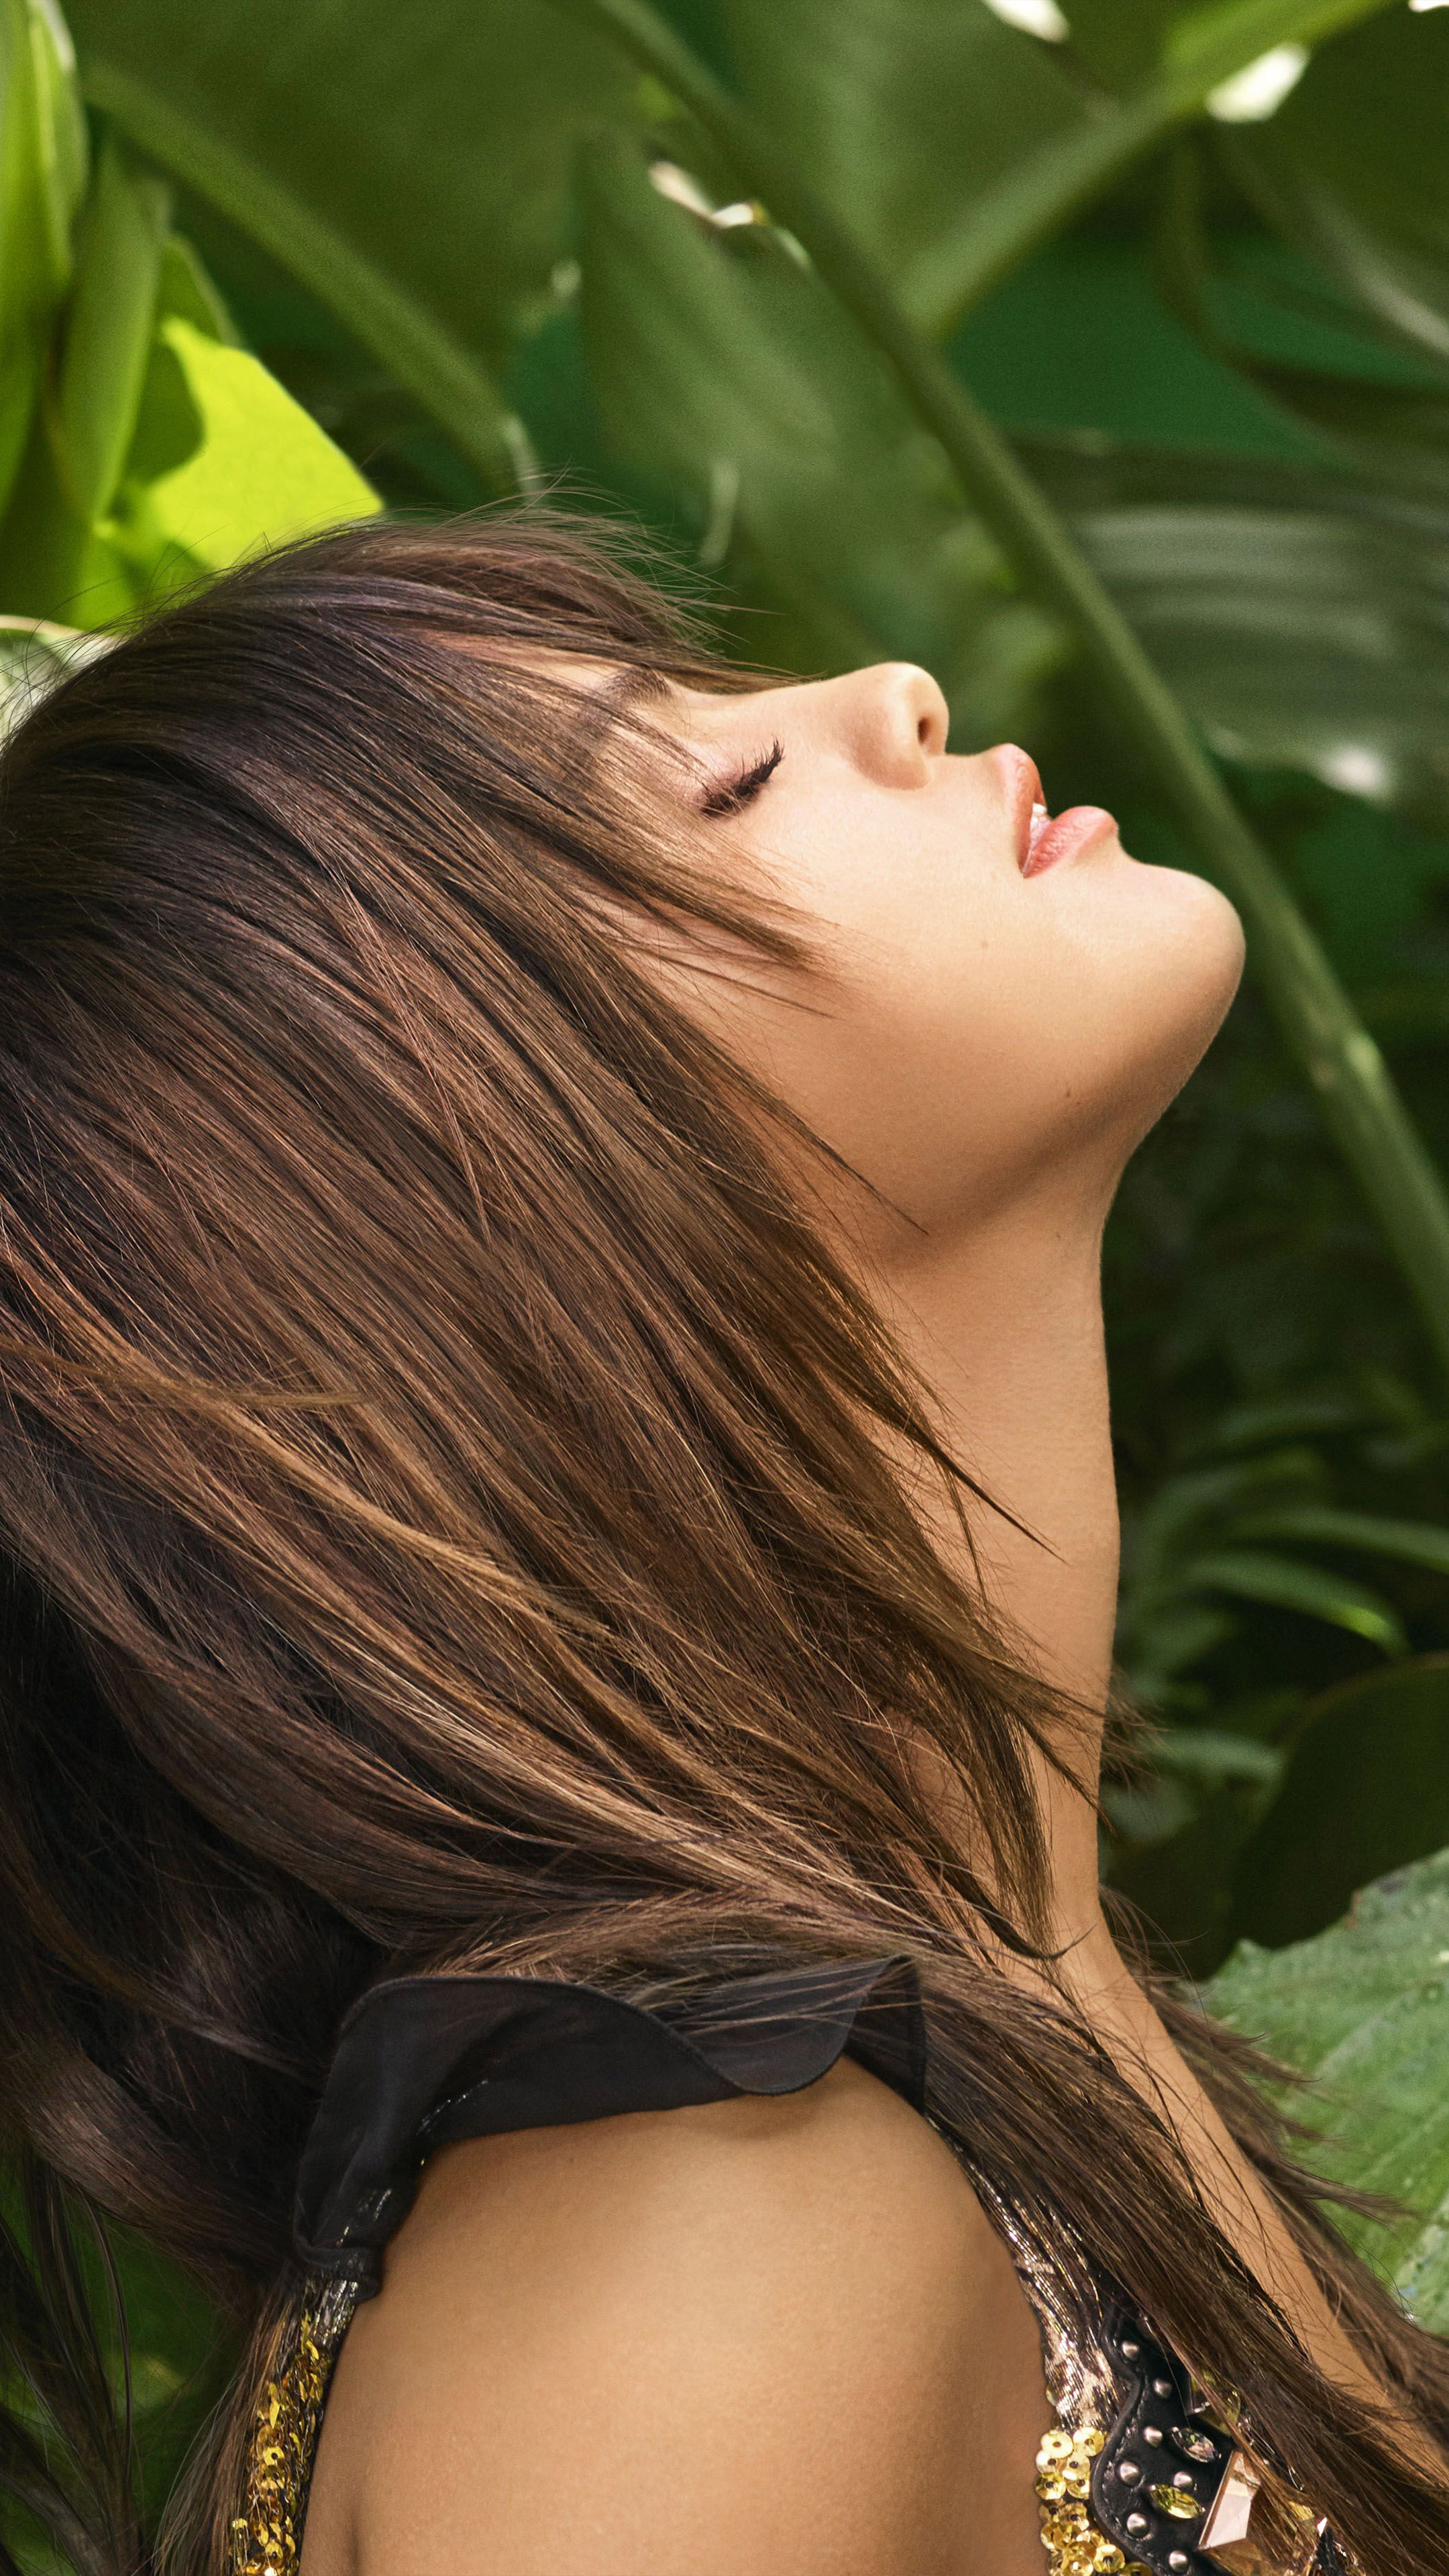 Download Selena Gomez Elle 2018 Leaves Background Free